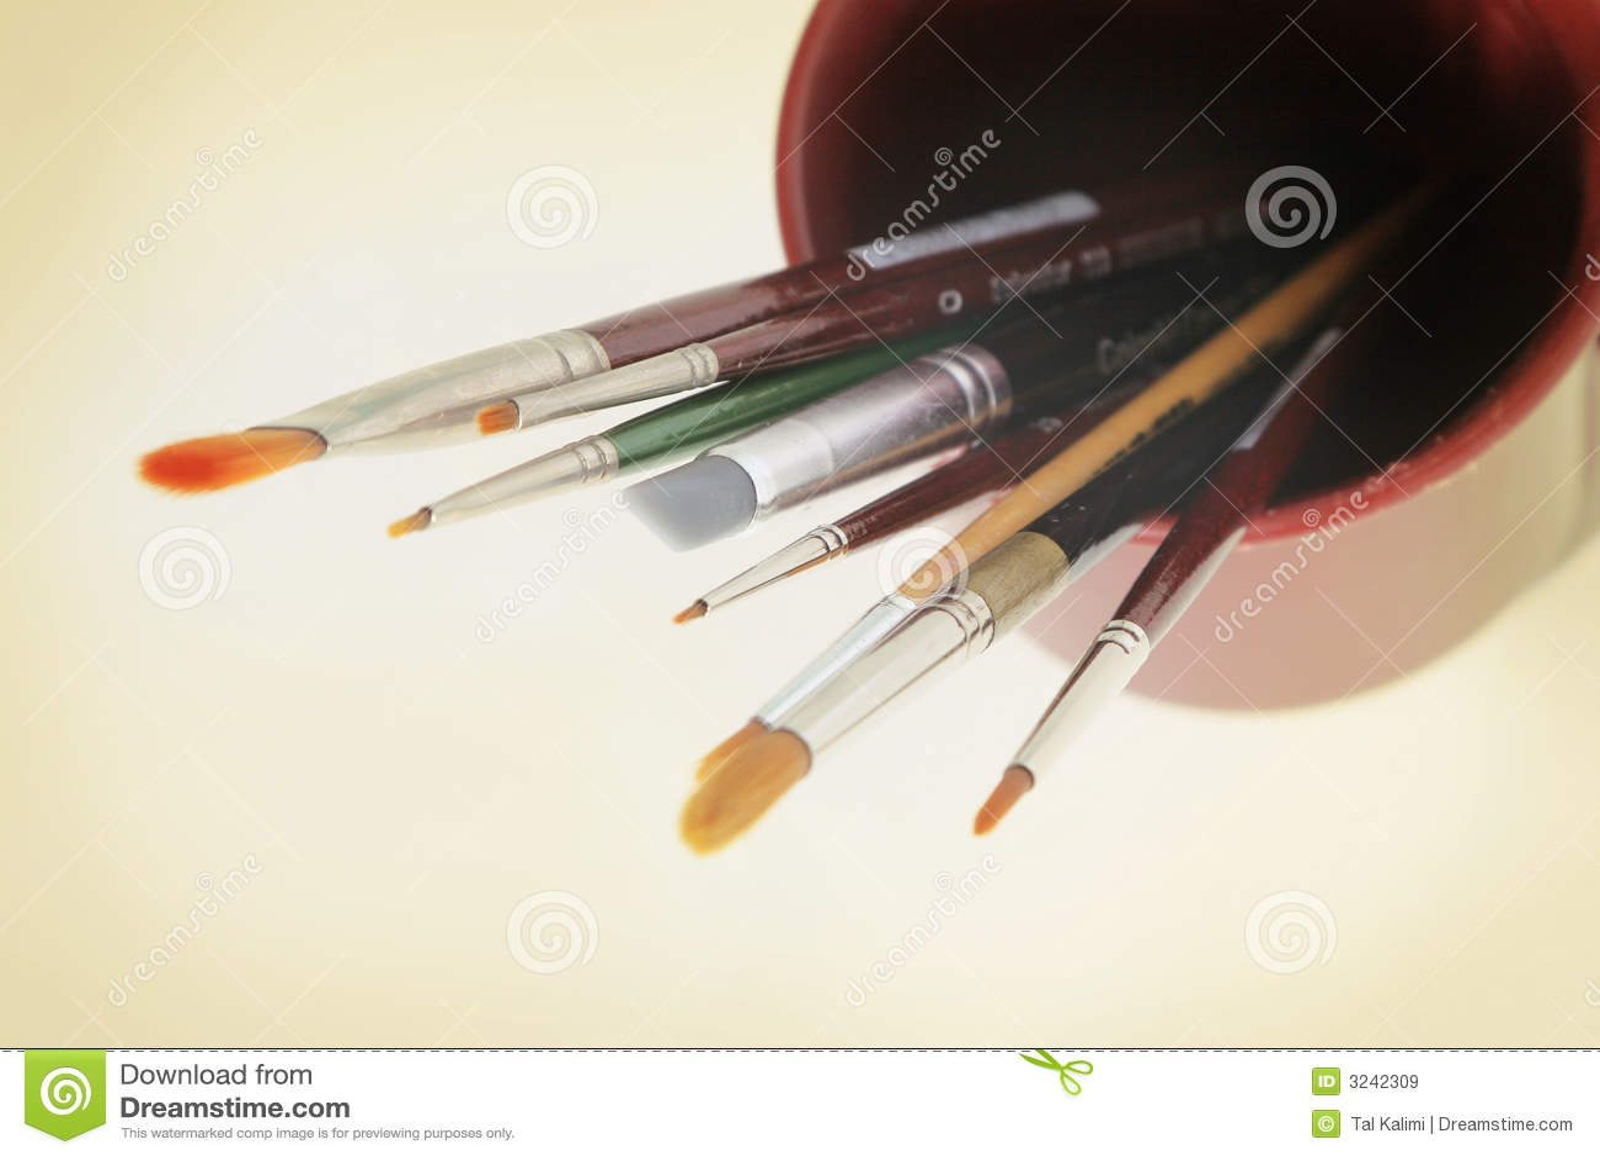 Kunsthilfsmittel - Pinsel